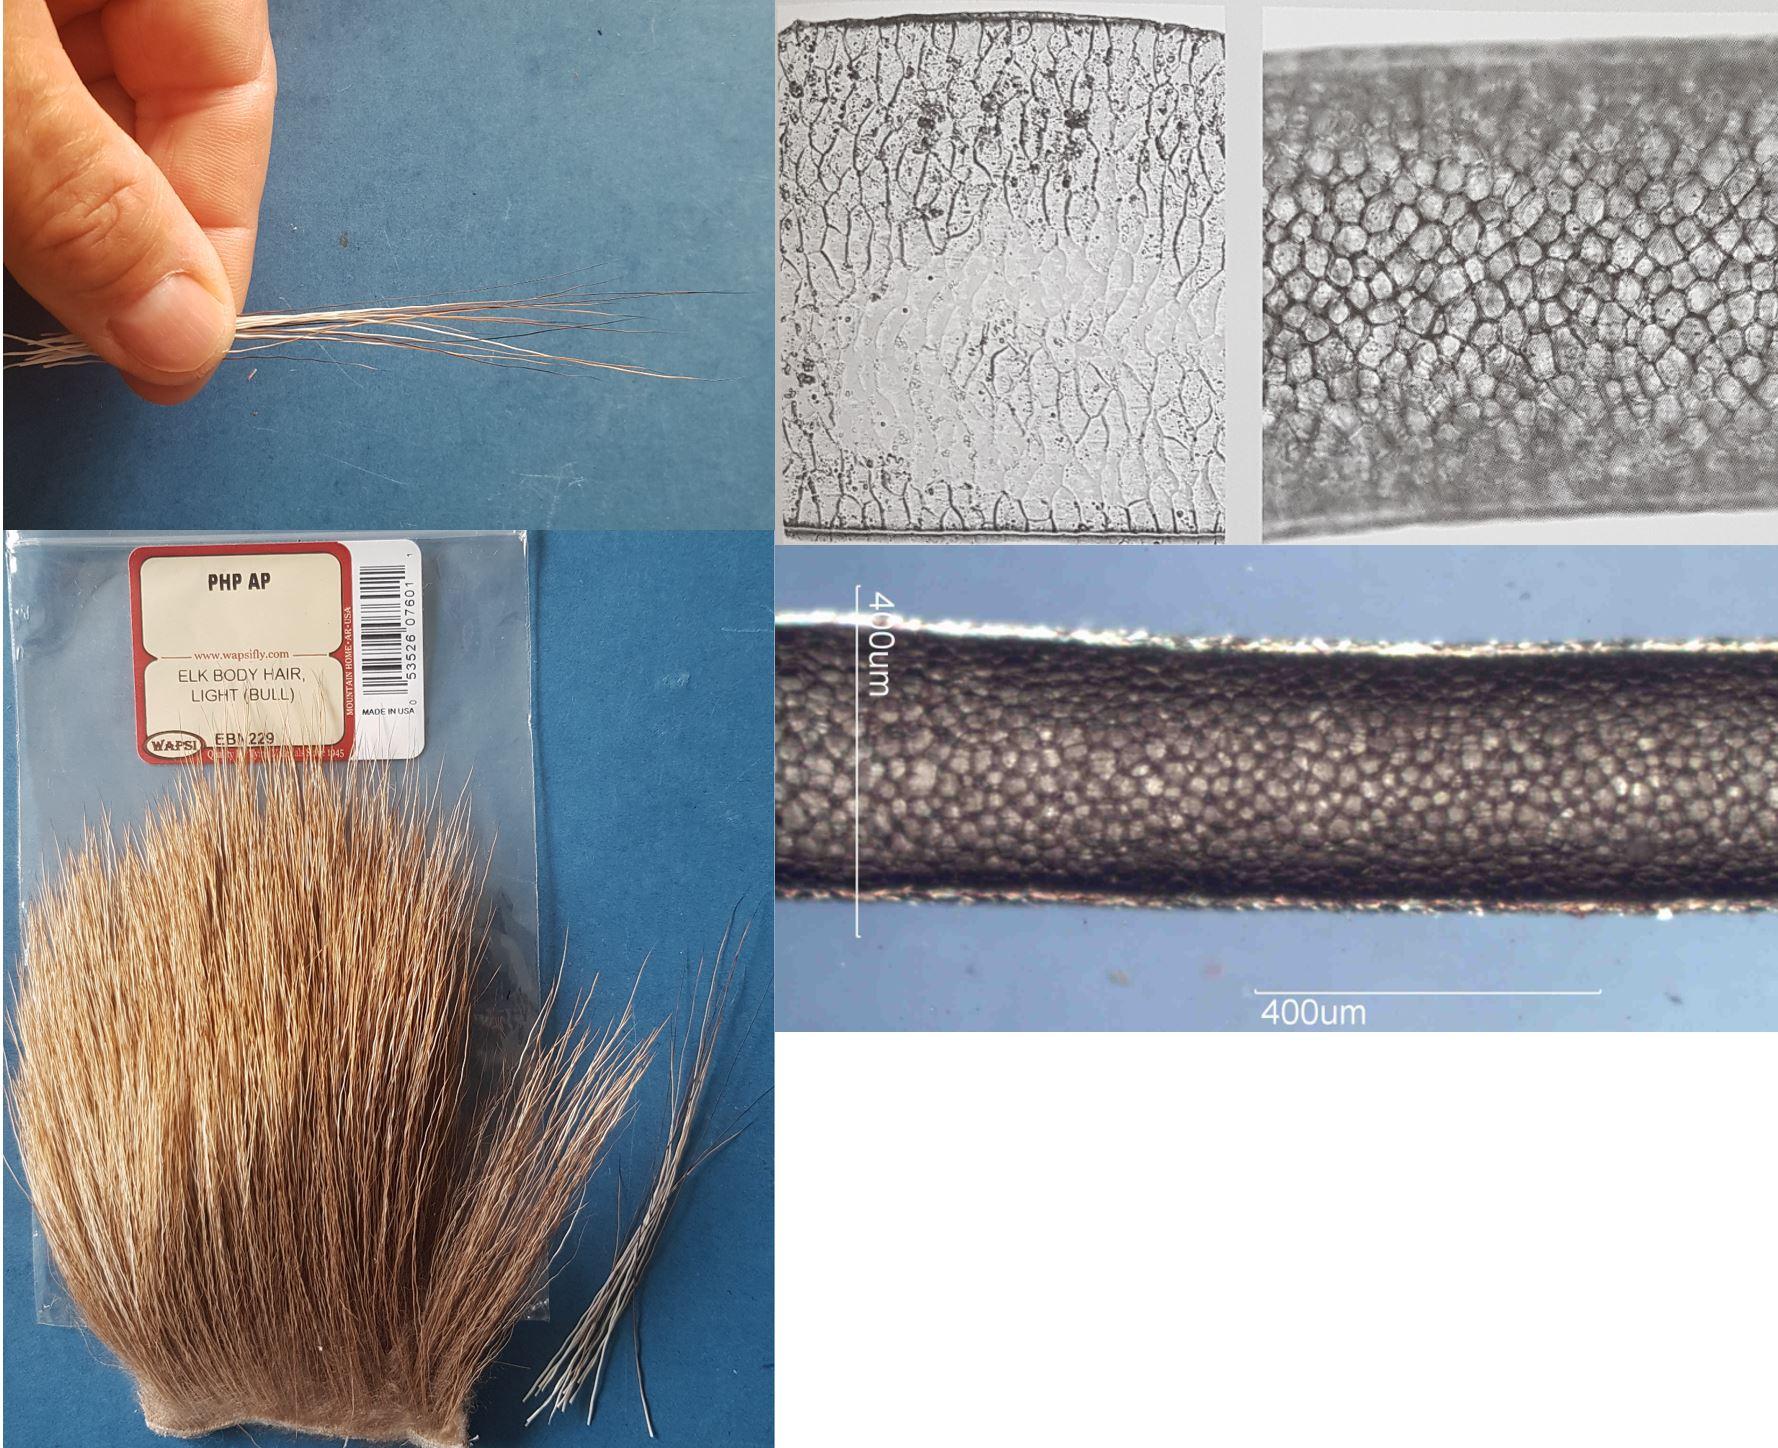 moose elan mane crinière poil hair fur elk body hair mouche fly tying éclosion